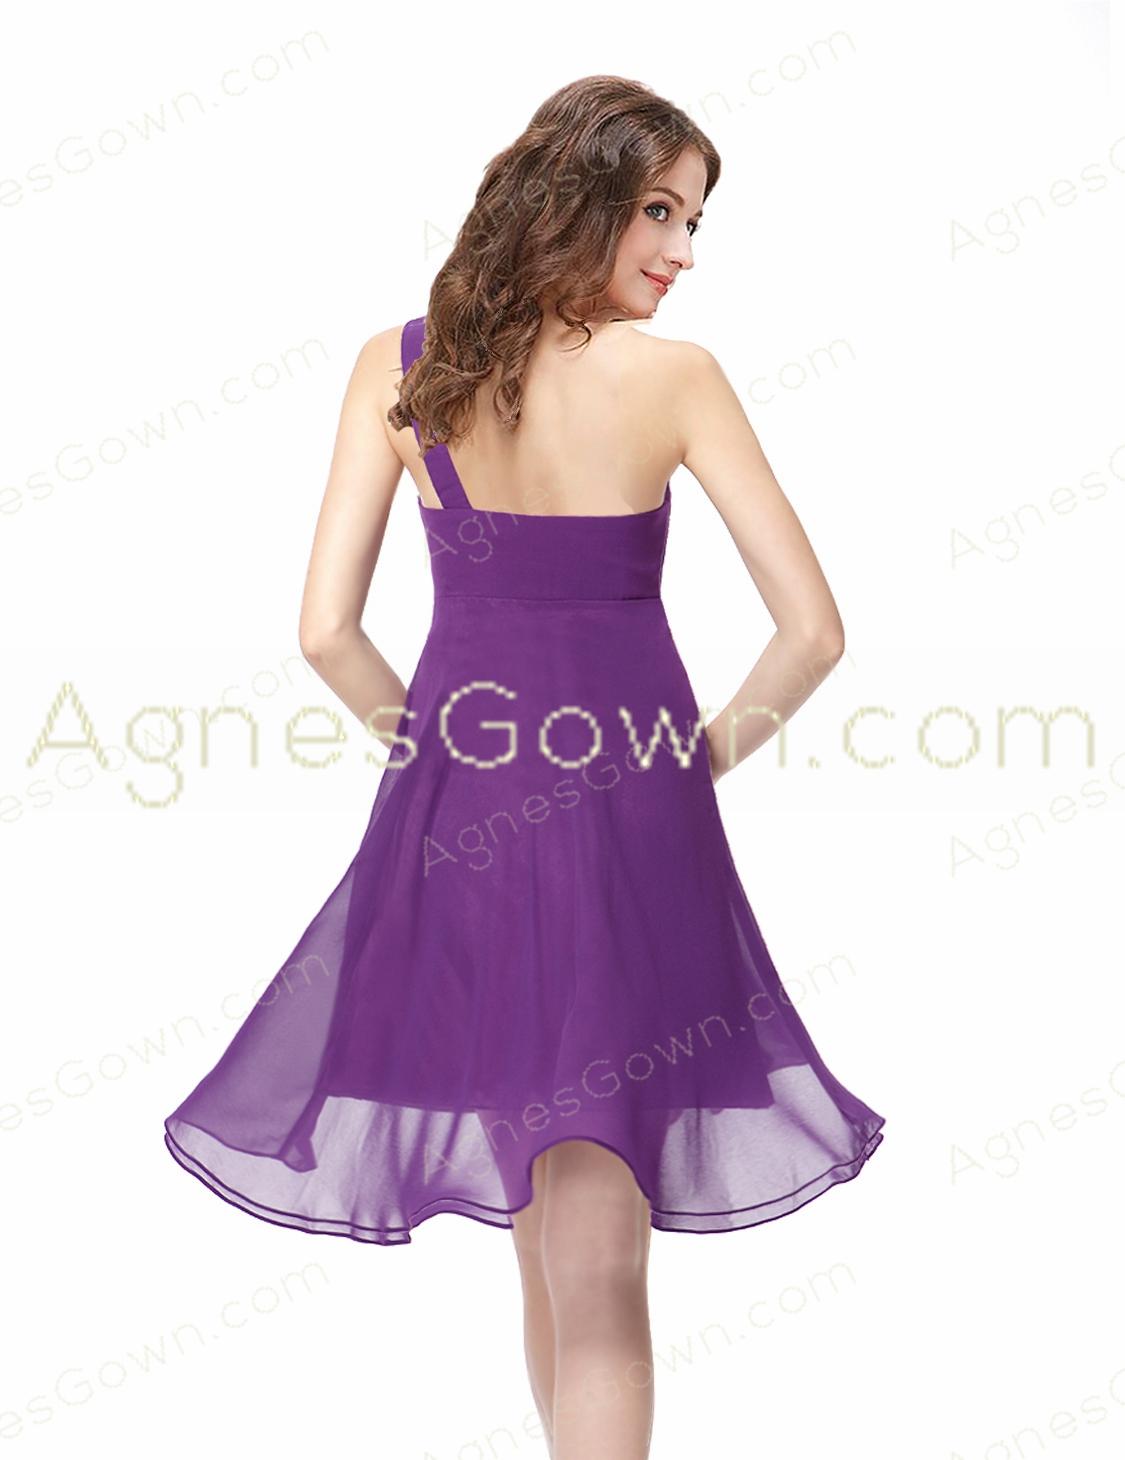 2016 Cute One Shoulder Empire Short Bridesmaid Dress For Maternity Women